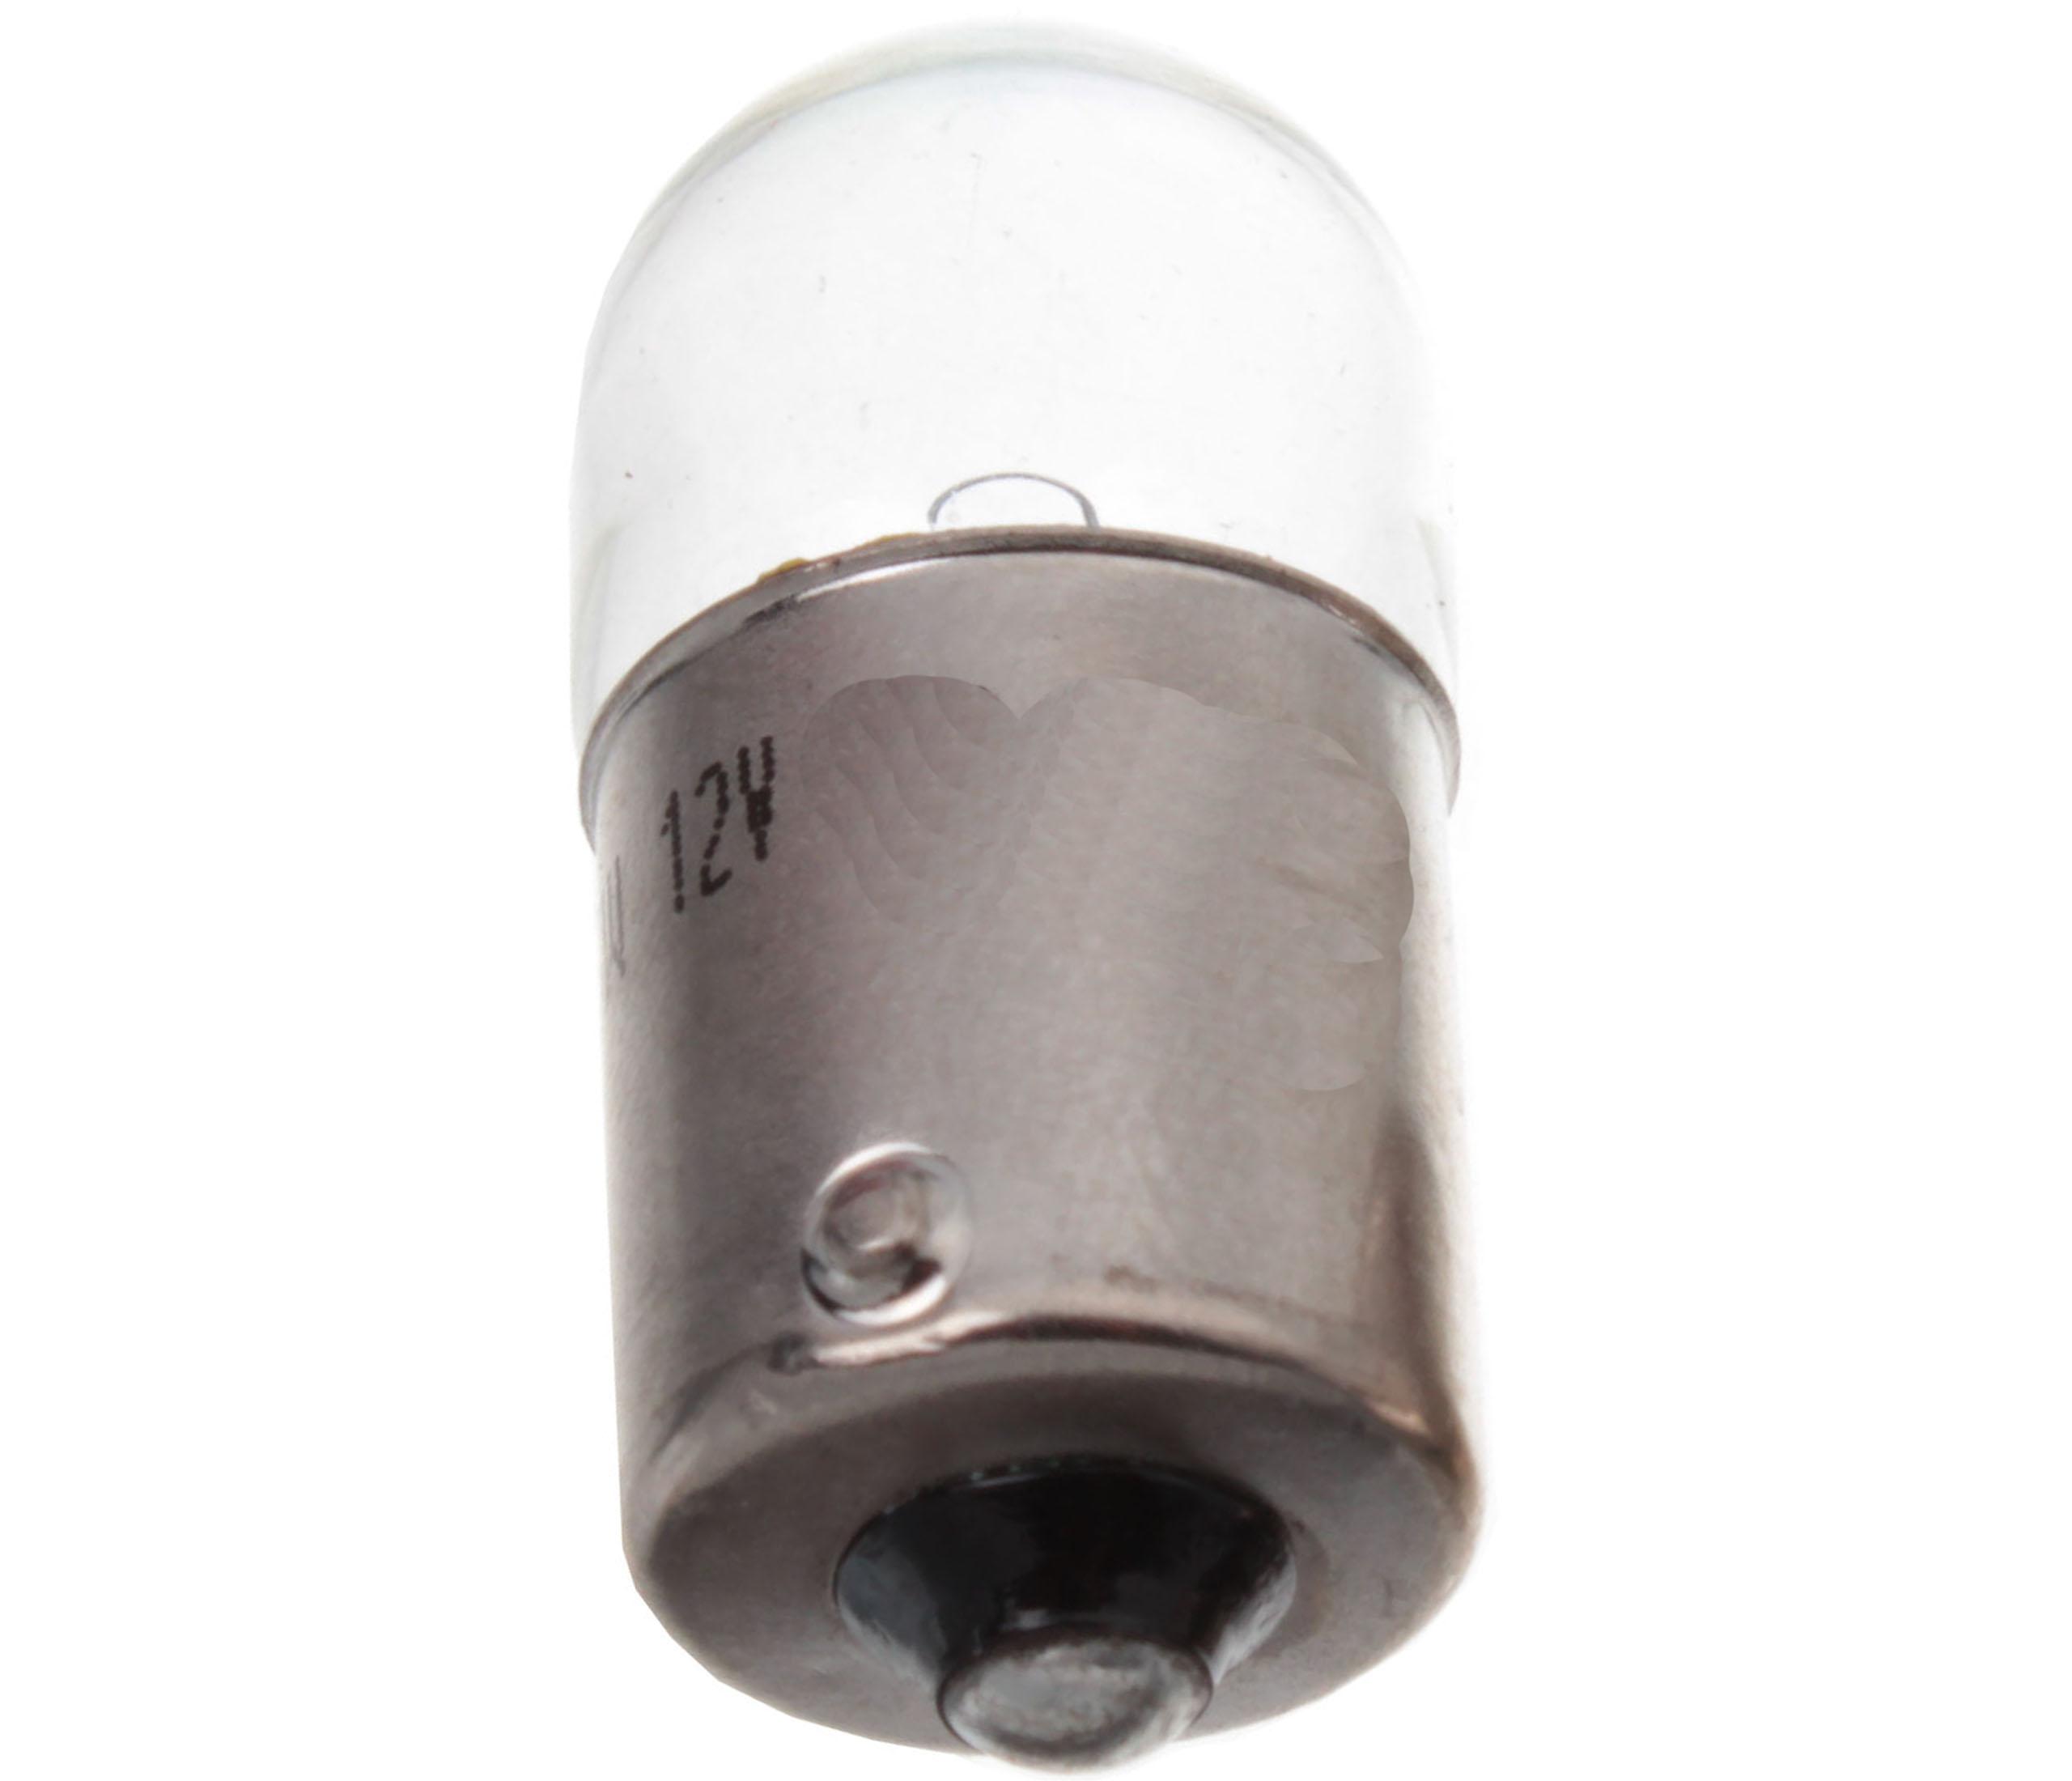 SIMSON MZ ETZ JAWA CZ THE LAMP 12V 5W G18 BA15S R5W